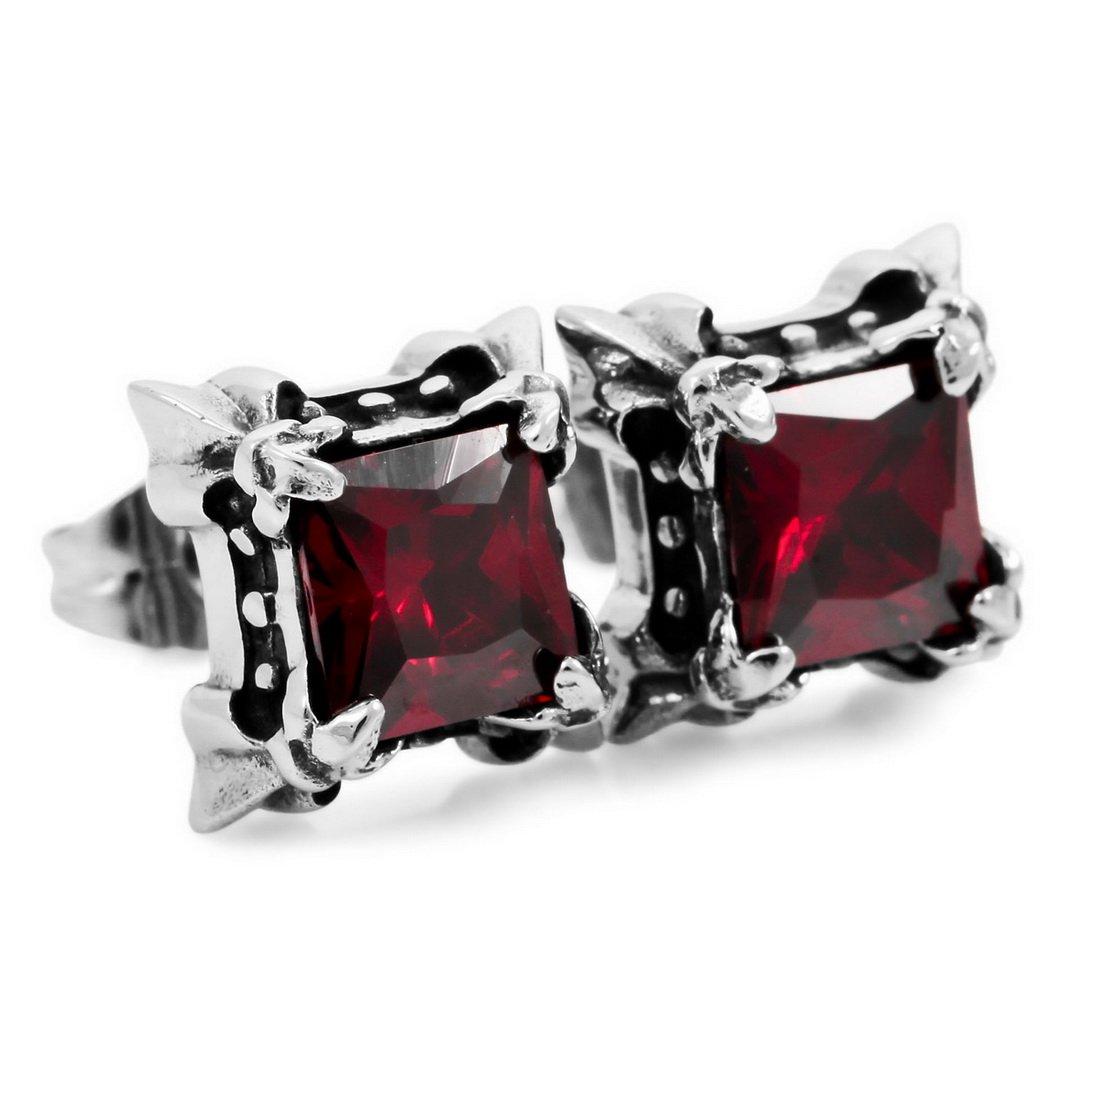 INBLUE Men's Stainless Steel Stud Earrings CZ Silver Tone Black Red Purple Green Dragon Claw Square INBLUE Jewelry mnp069-1